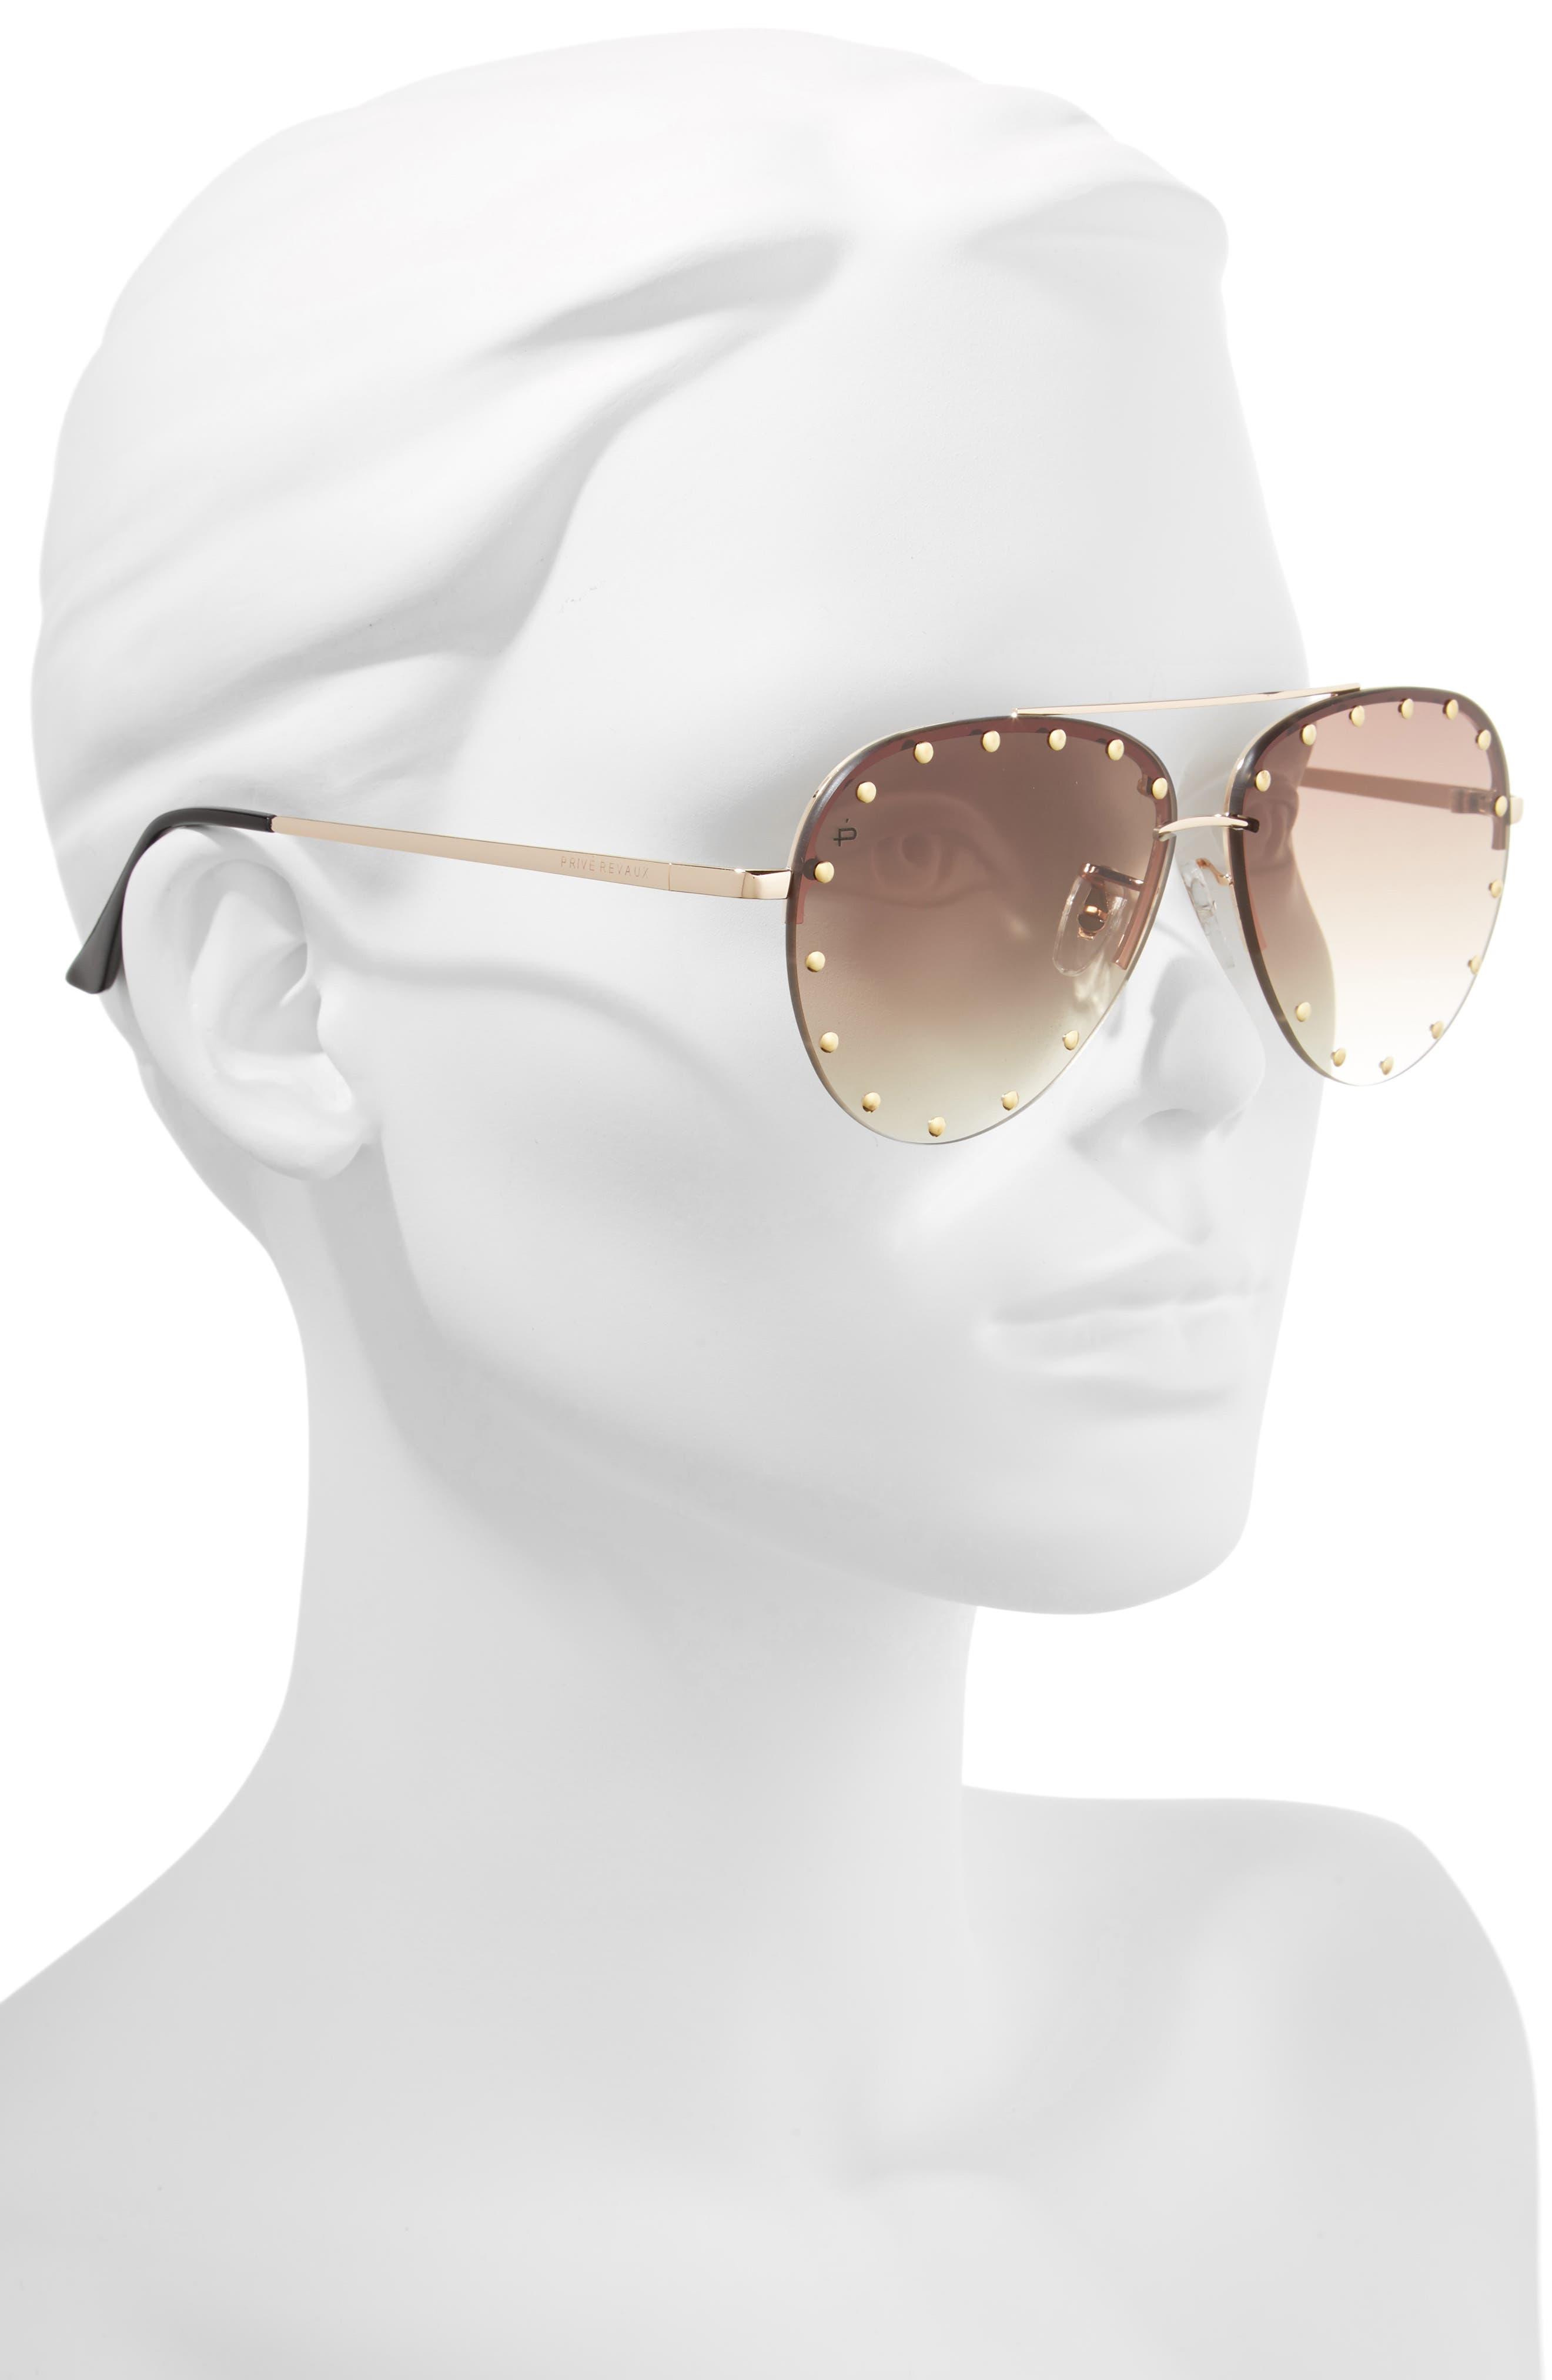 Privé Revaux The Sixth Man 60mm Studded Aviator Sunglasses,                             Alternate thumbnail 5, color,